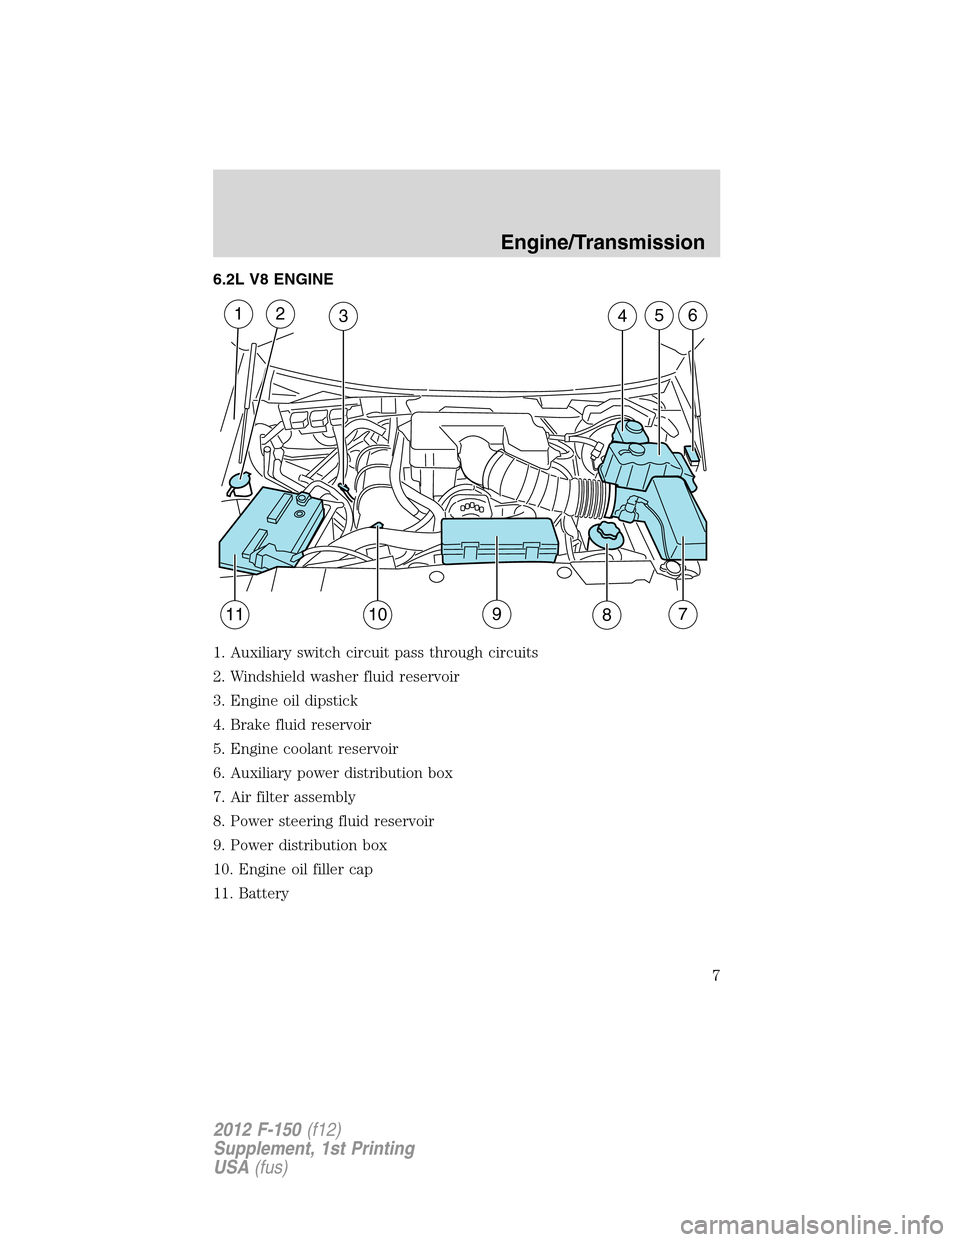 Ford F150 2012 12g Raptor Supplement Manual F 150 Engine Diagram